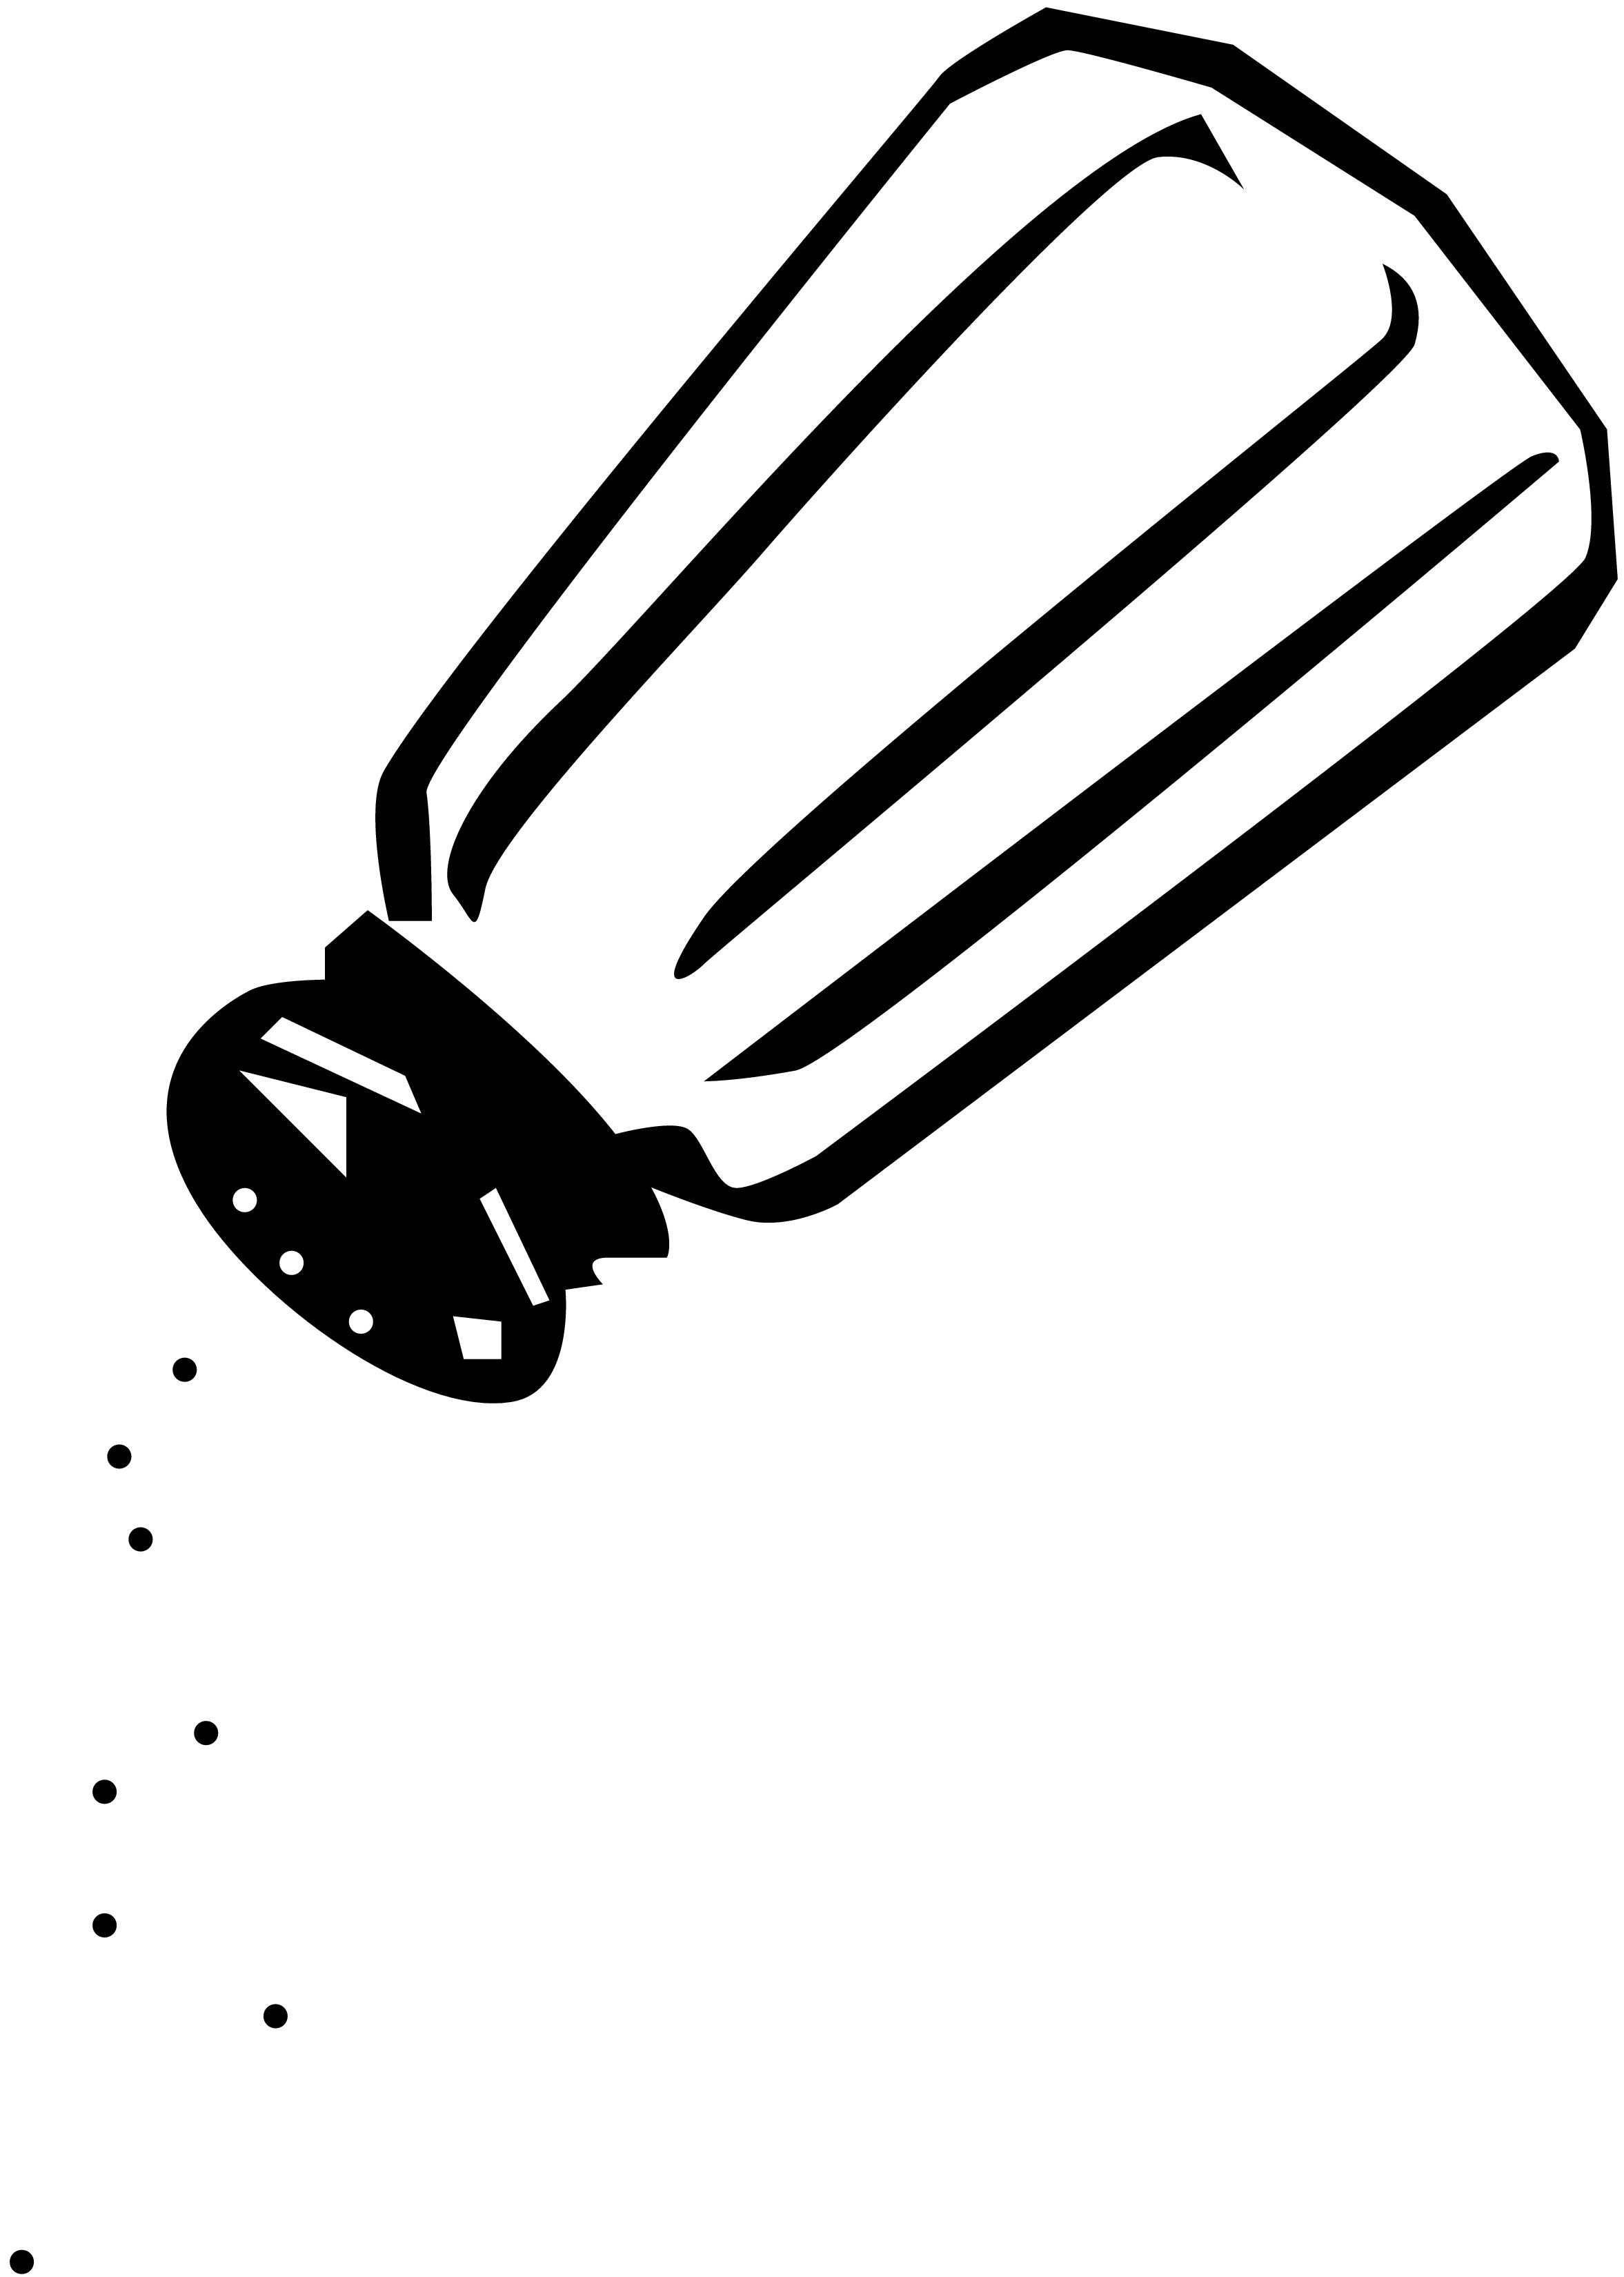 Salt Clip Art Free | Clipart Panda - Free Clipart Images